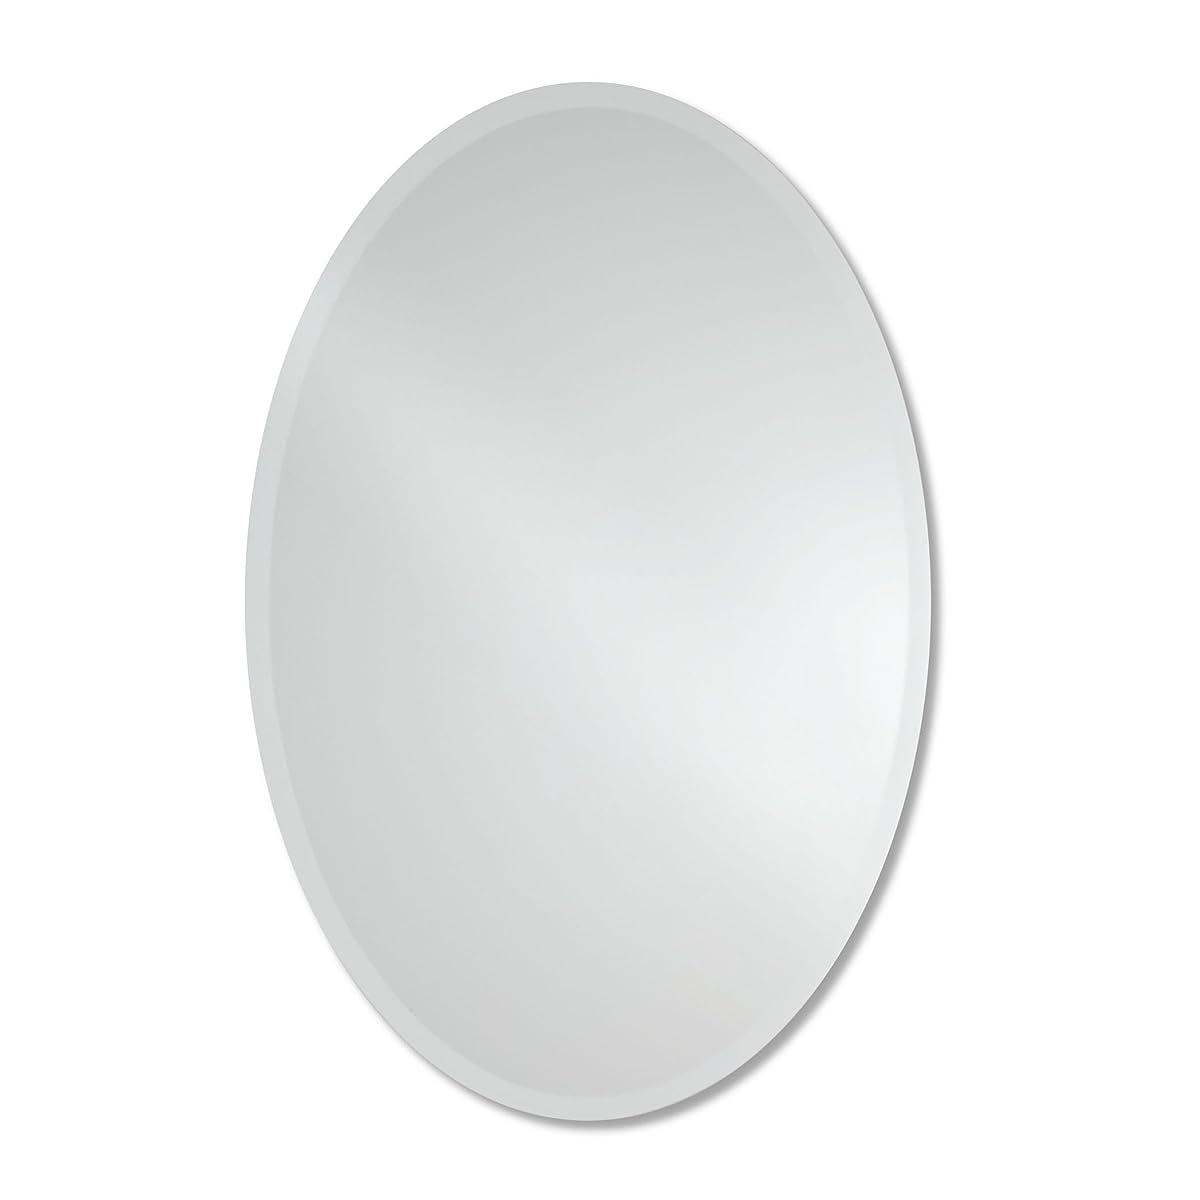 Large Frameless Beveled Oval Wall Mirror   Bathroom, Vanity, Bedroom Mirror   24-inch x 36-inch